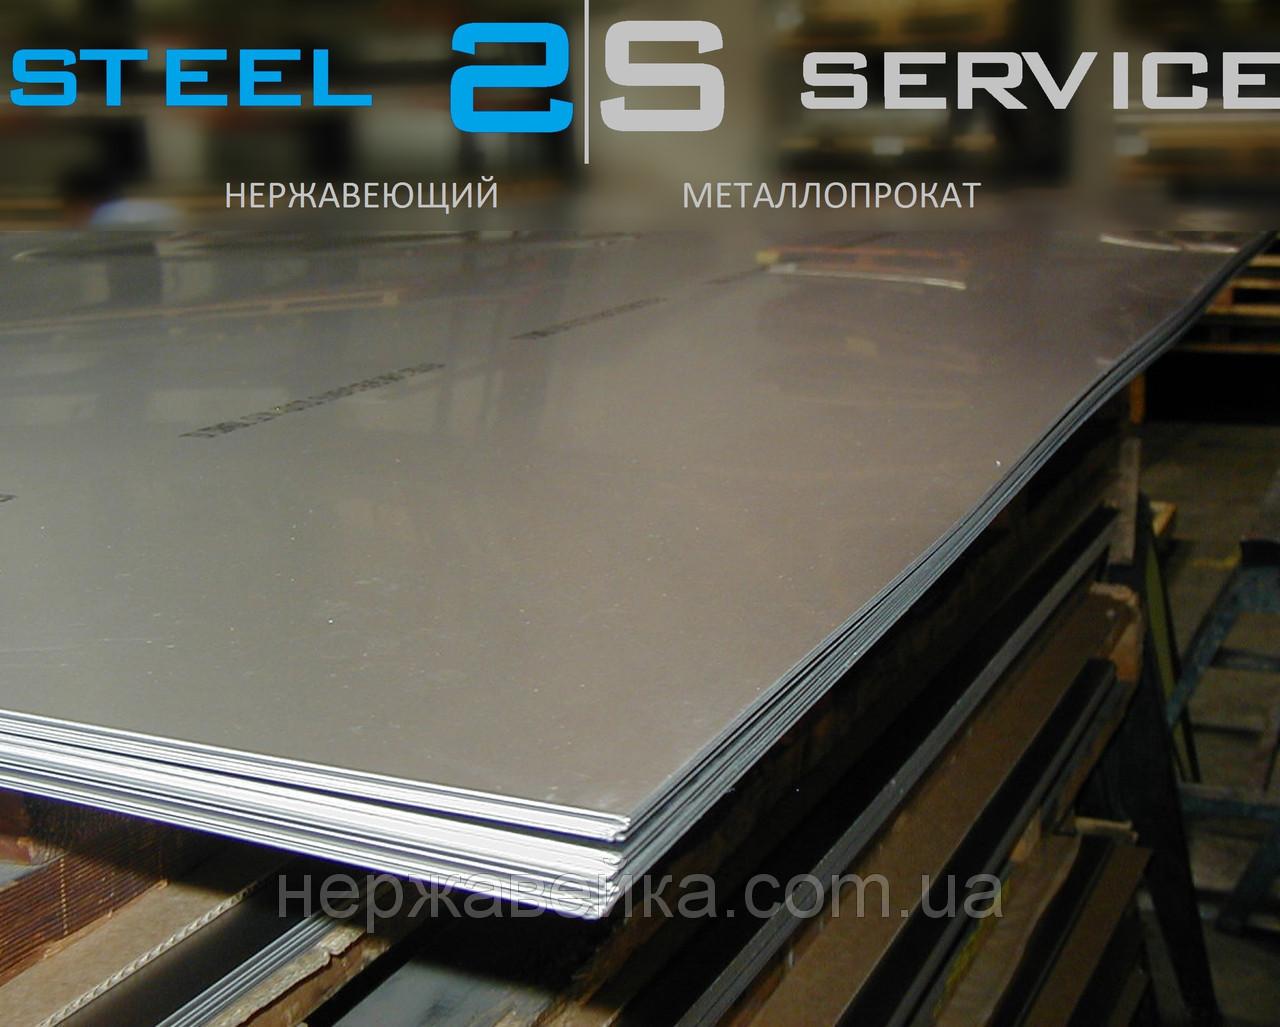 Нержавеющий лист 3х1250х2500мм AISI 430(12Х17) 2B - матовый, технический